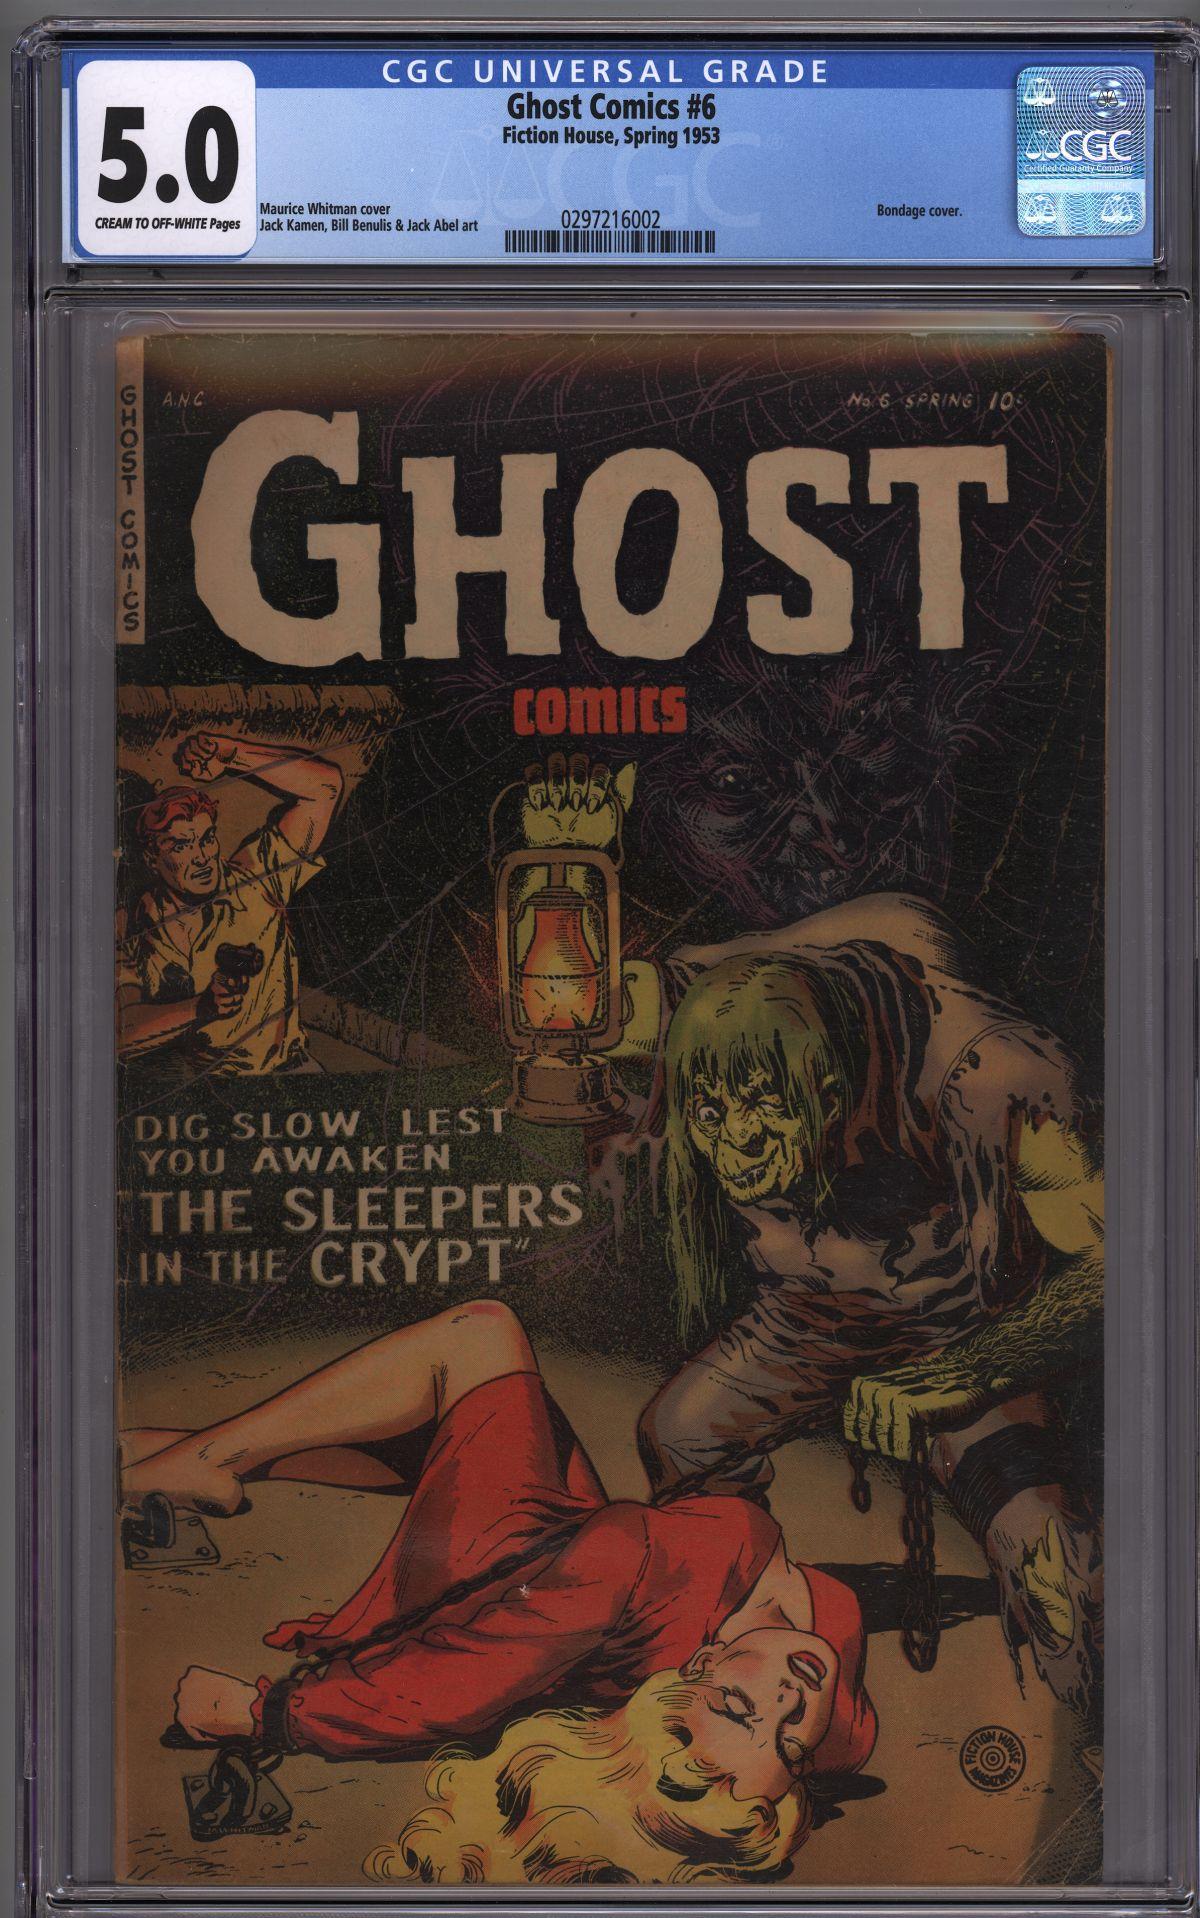 Couple PCH Books Fiction House Ghost Comics #6 , Man O Mars